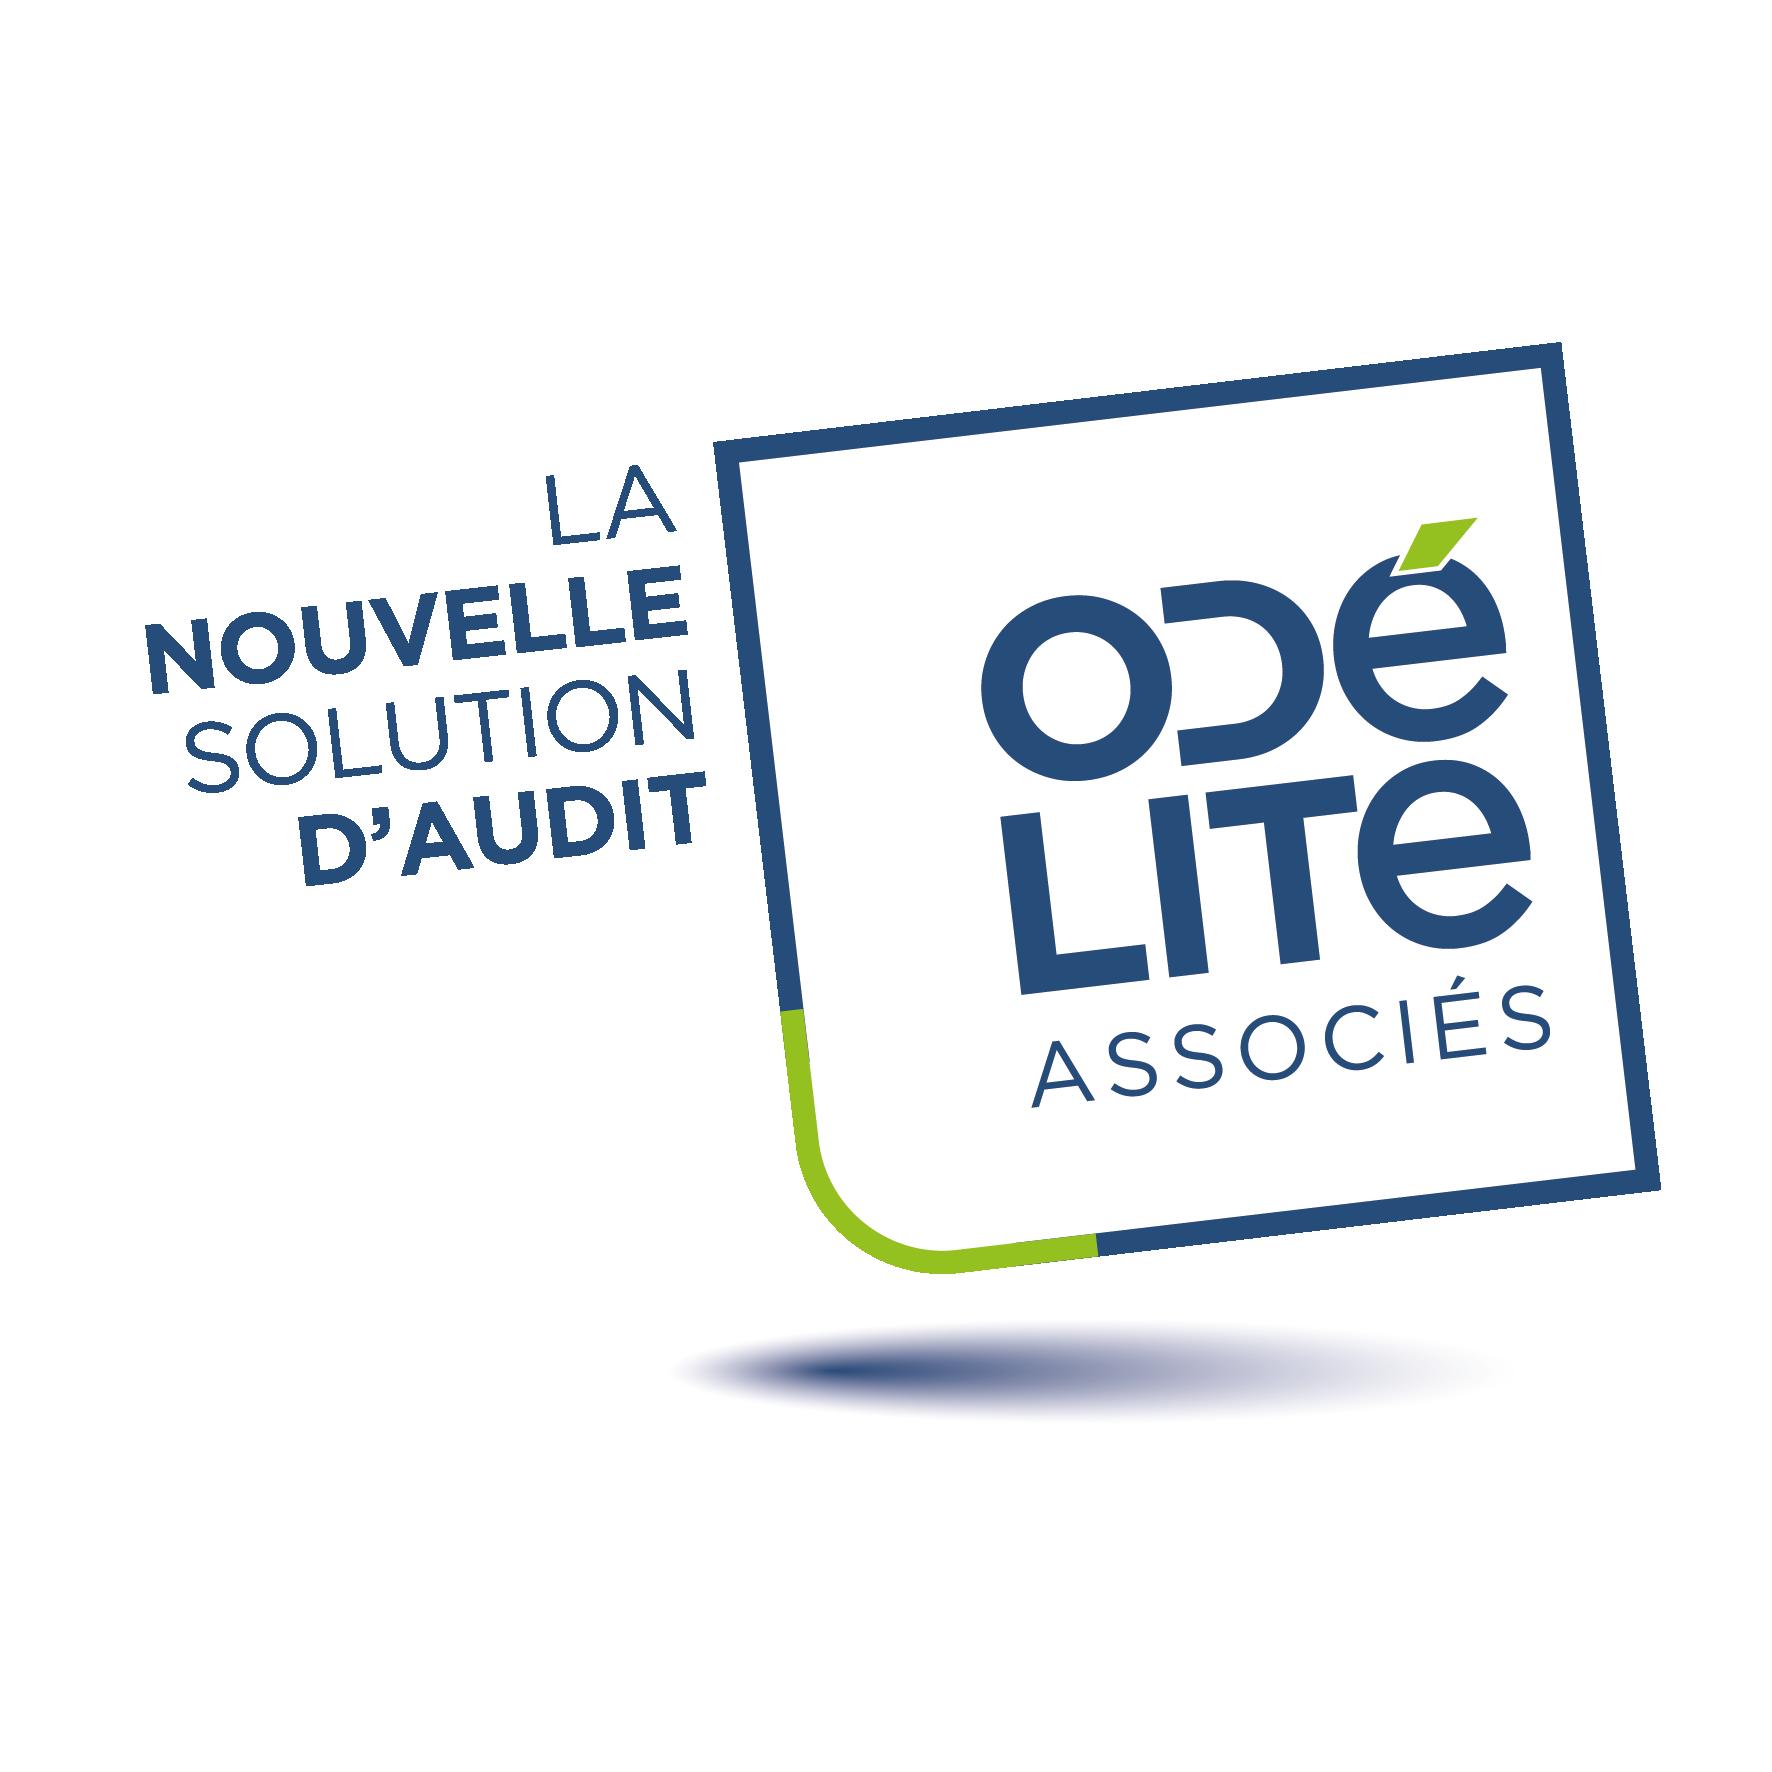 logo ODELITE ASSOCIES